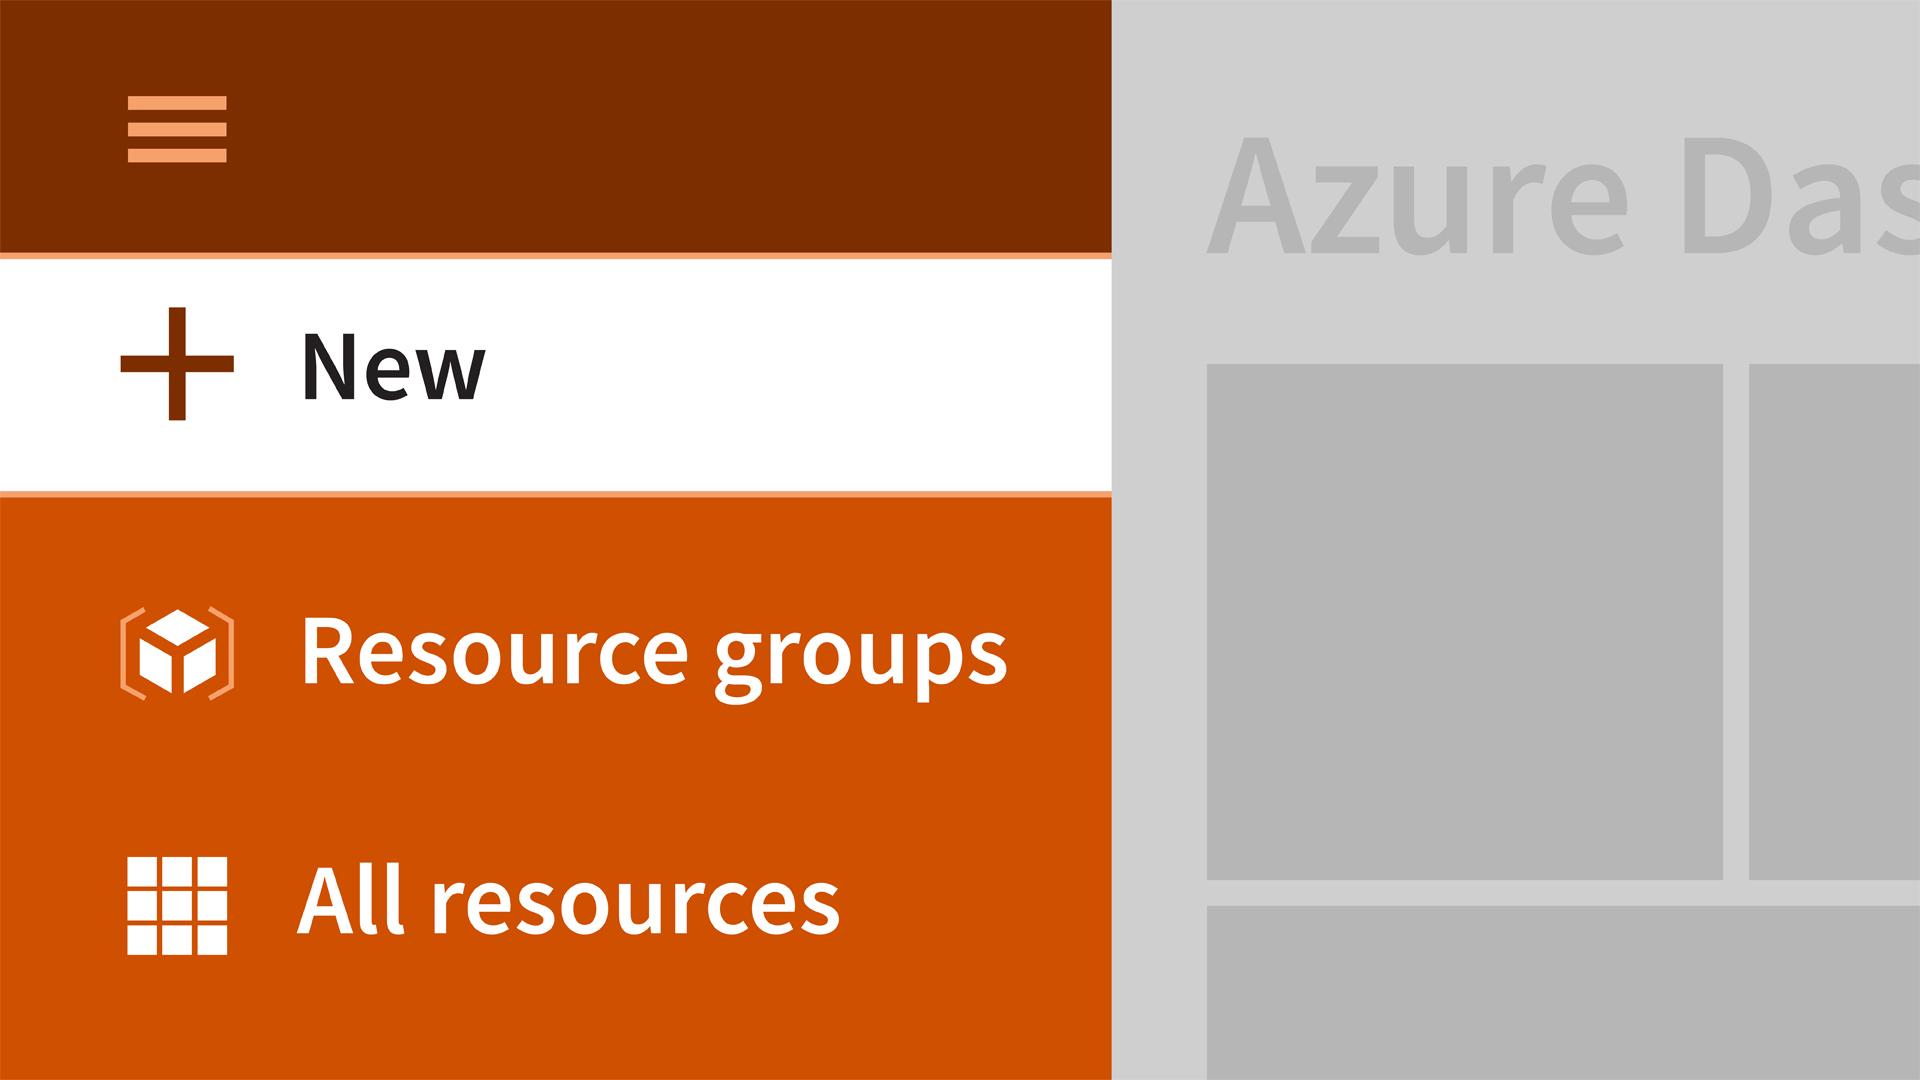 Microsoft Azure: Core Functionalities